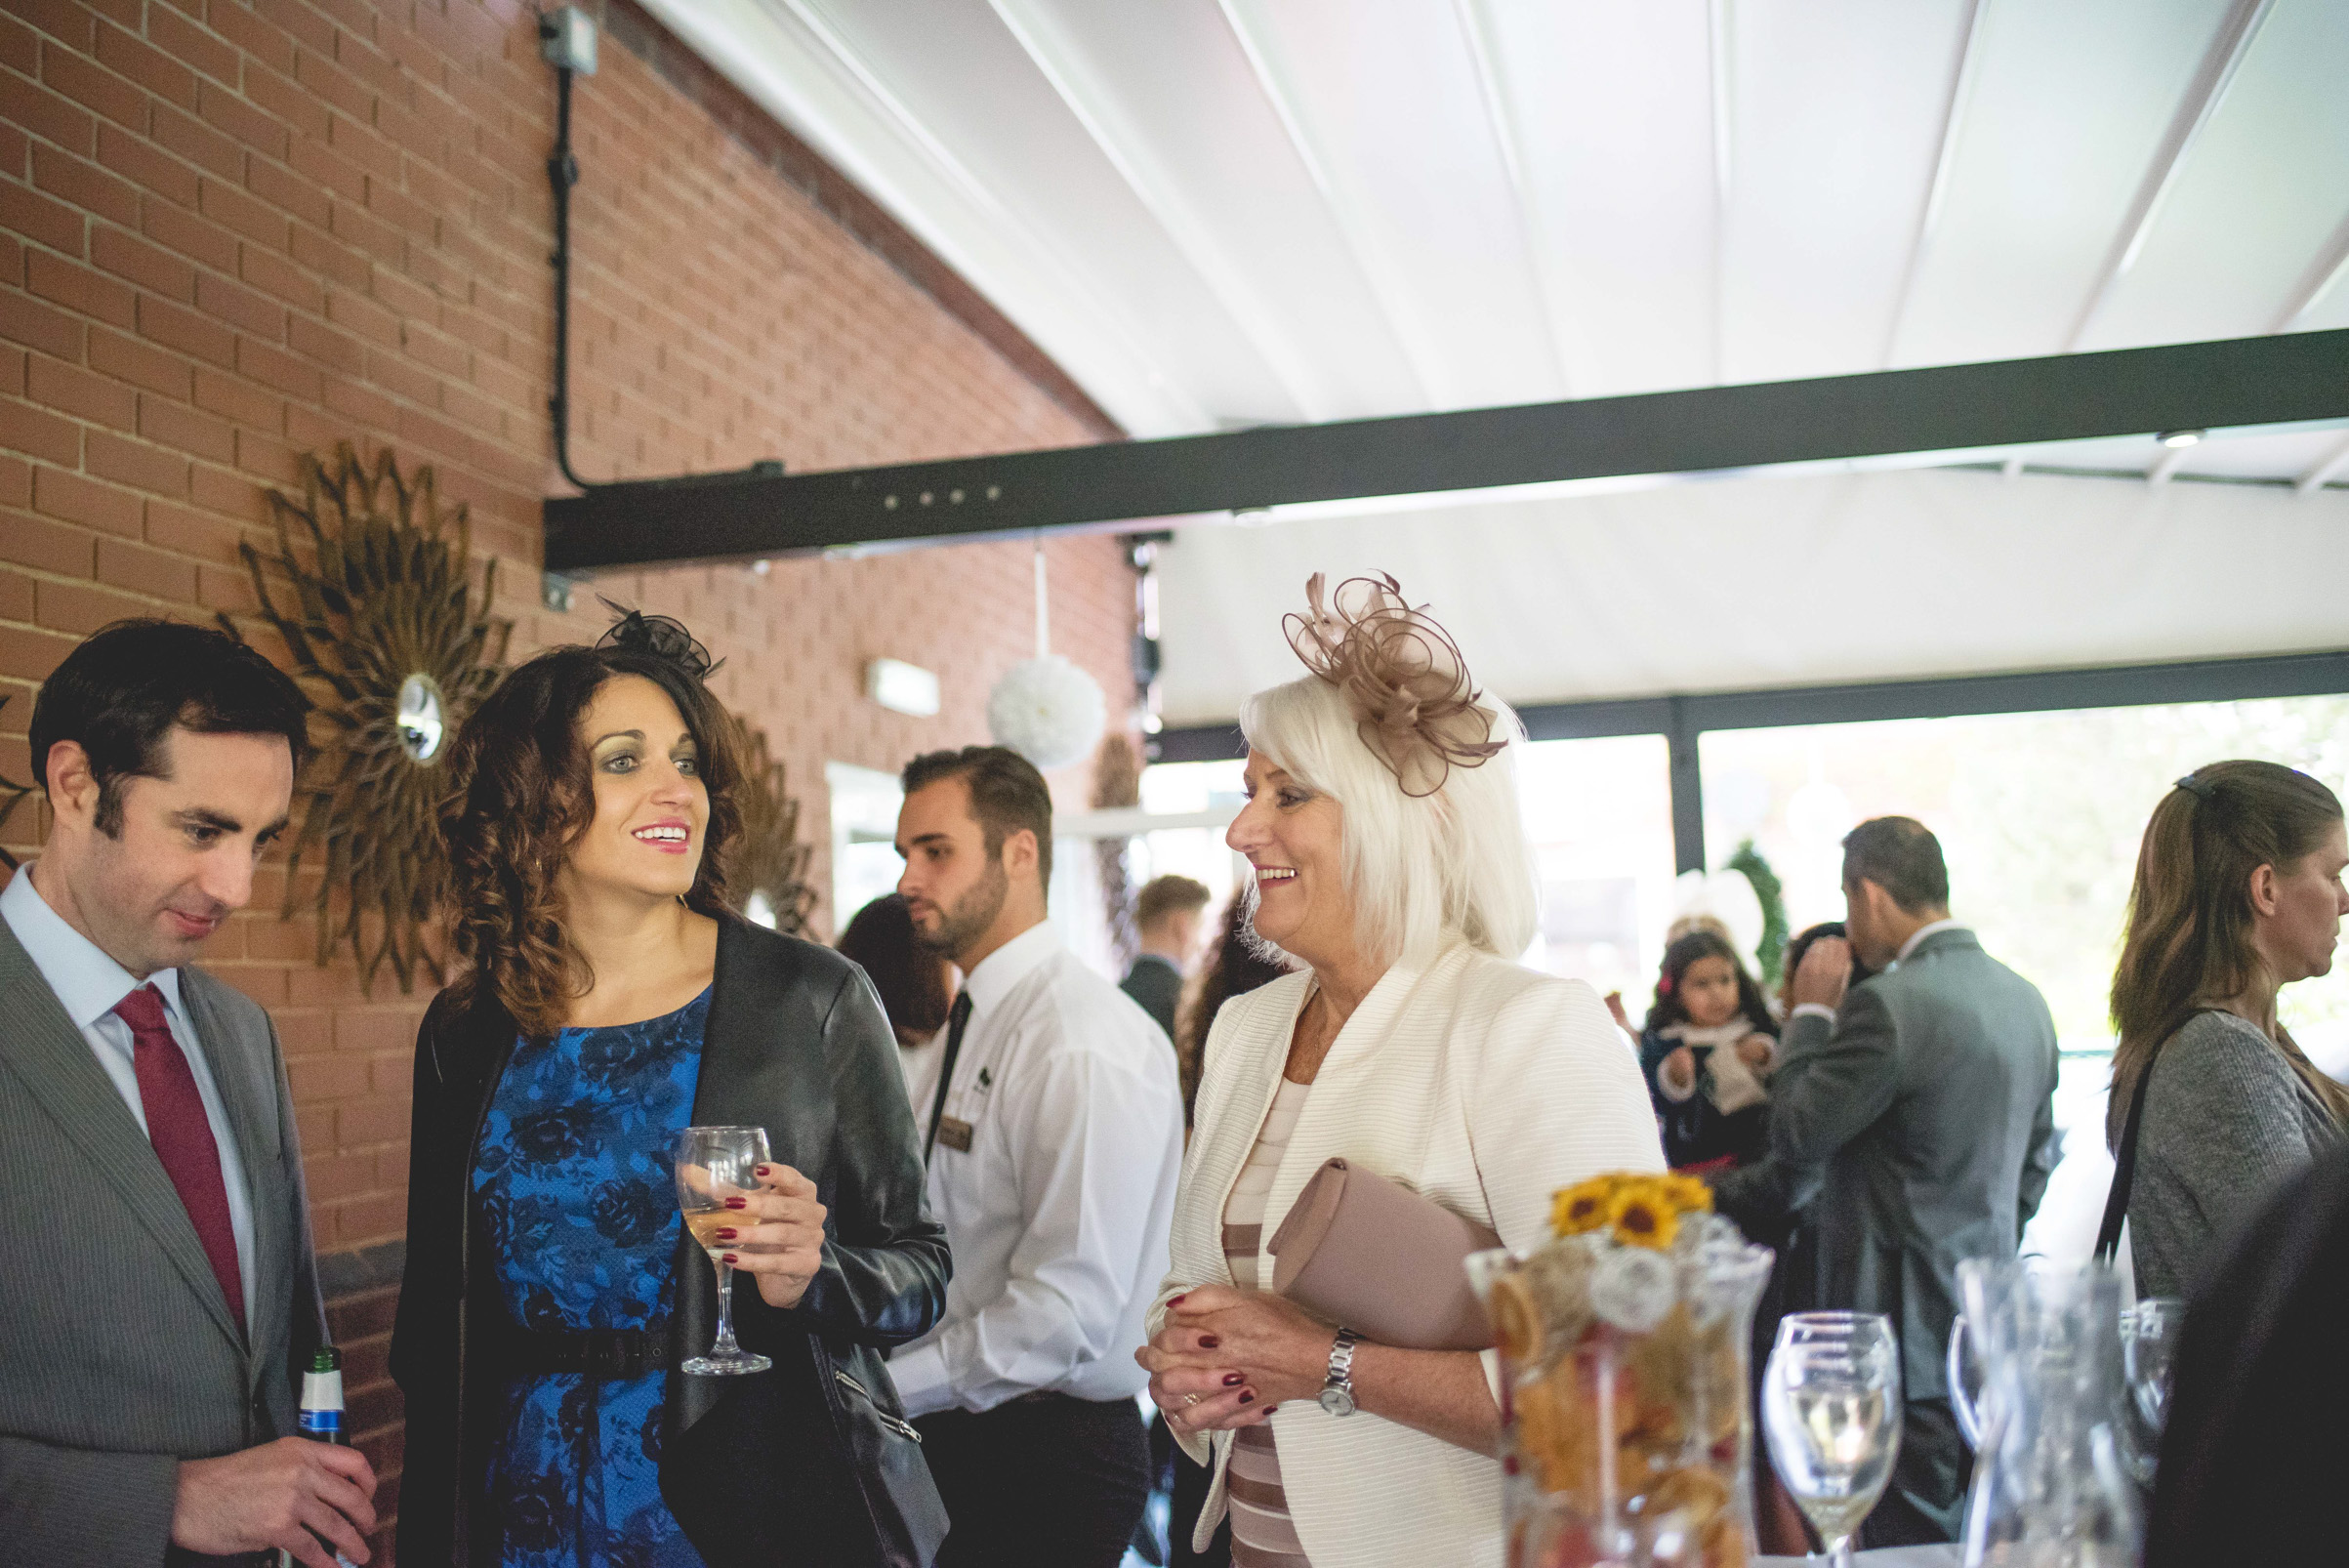 The+Fairlawns+wedding+Aldridge+StLukes+Church-143.jpg